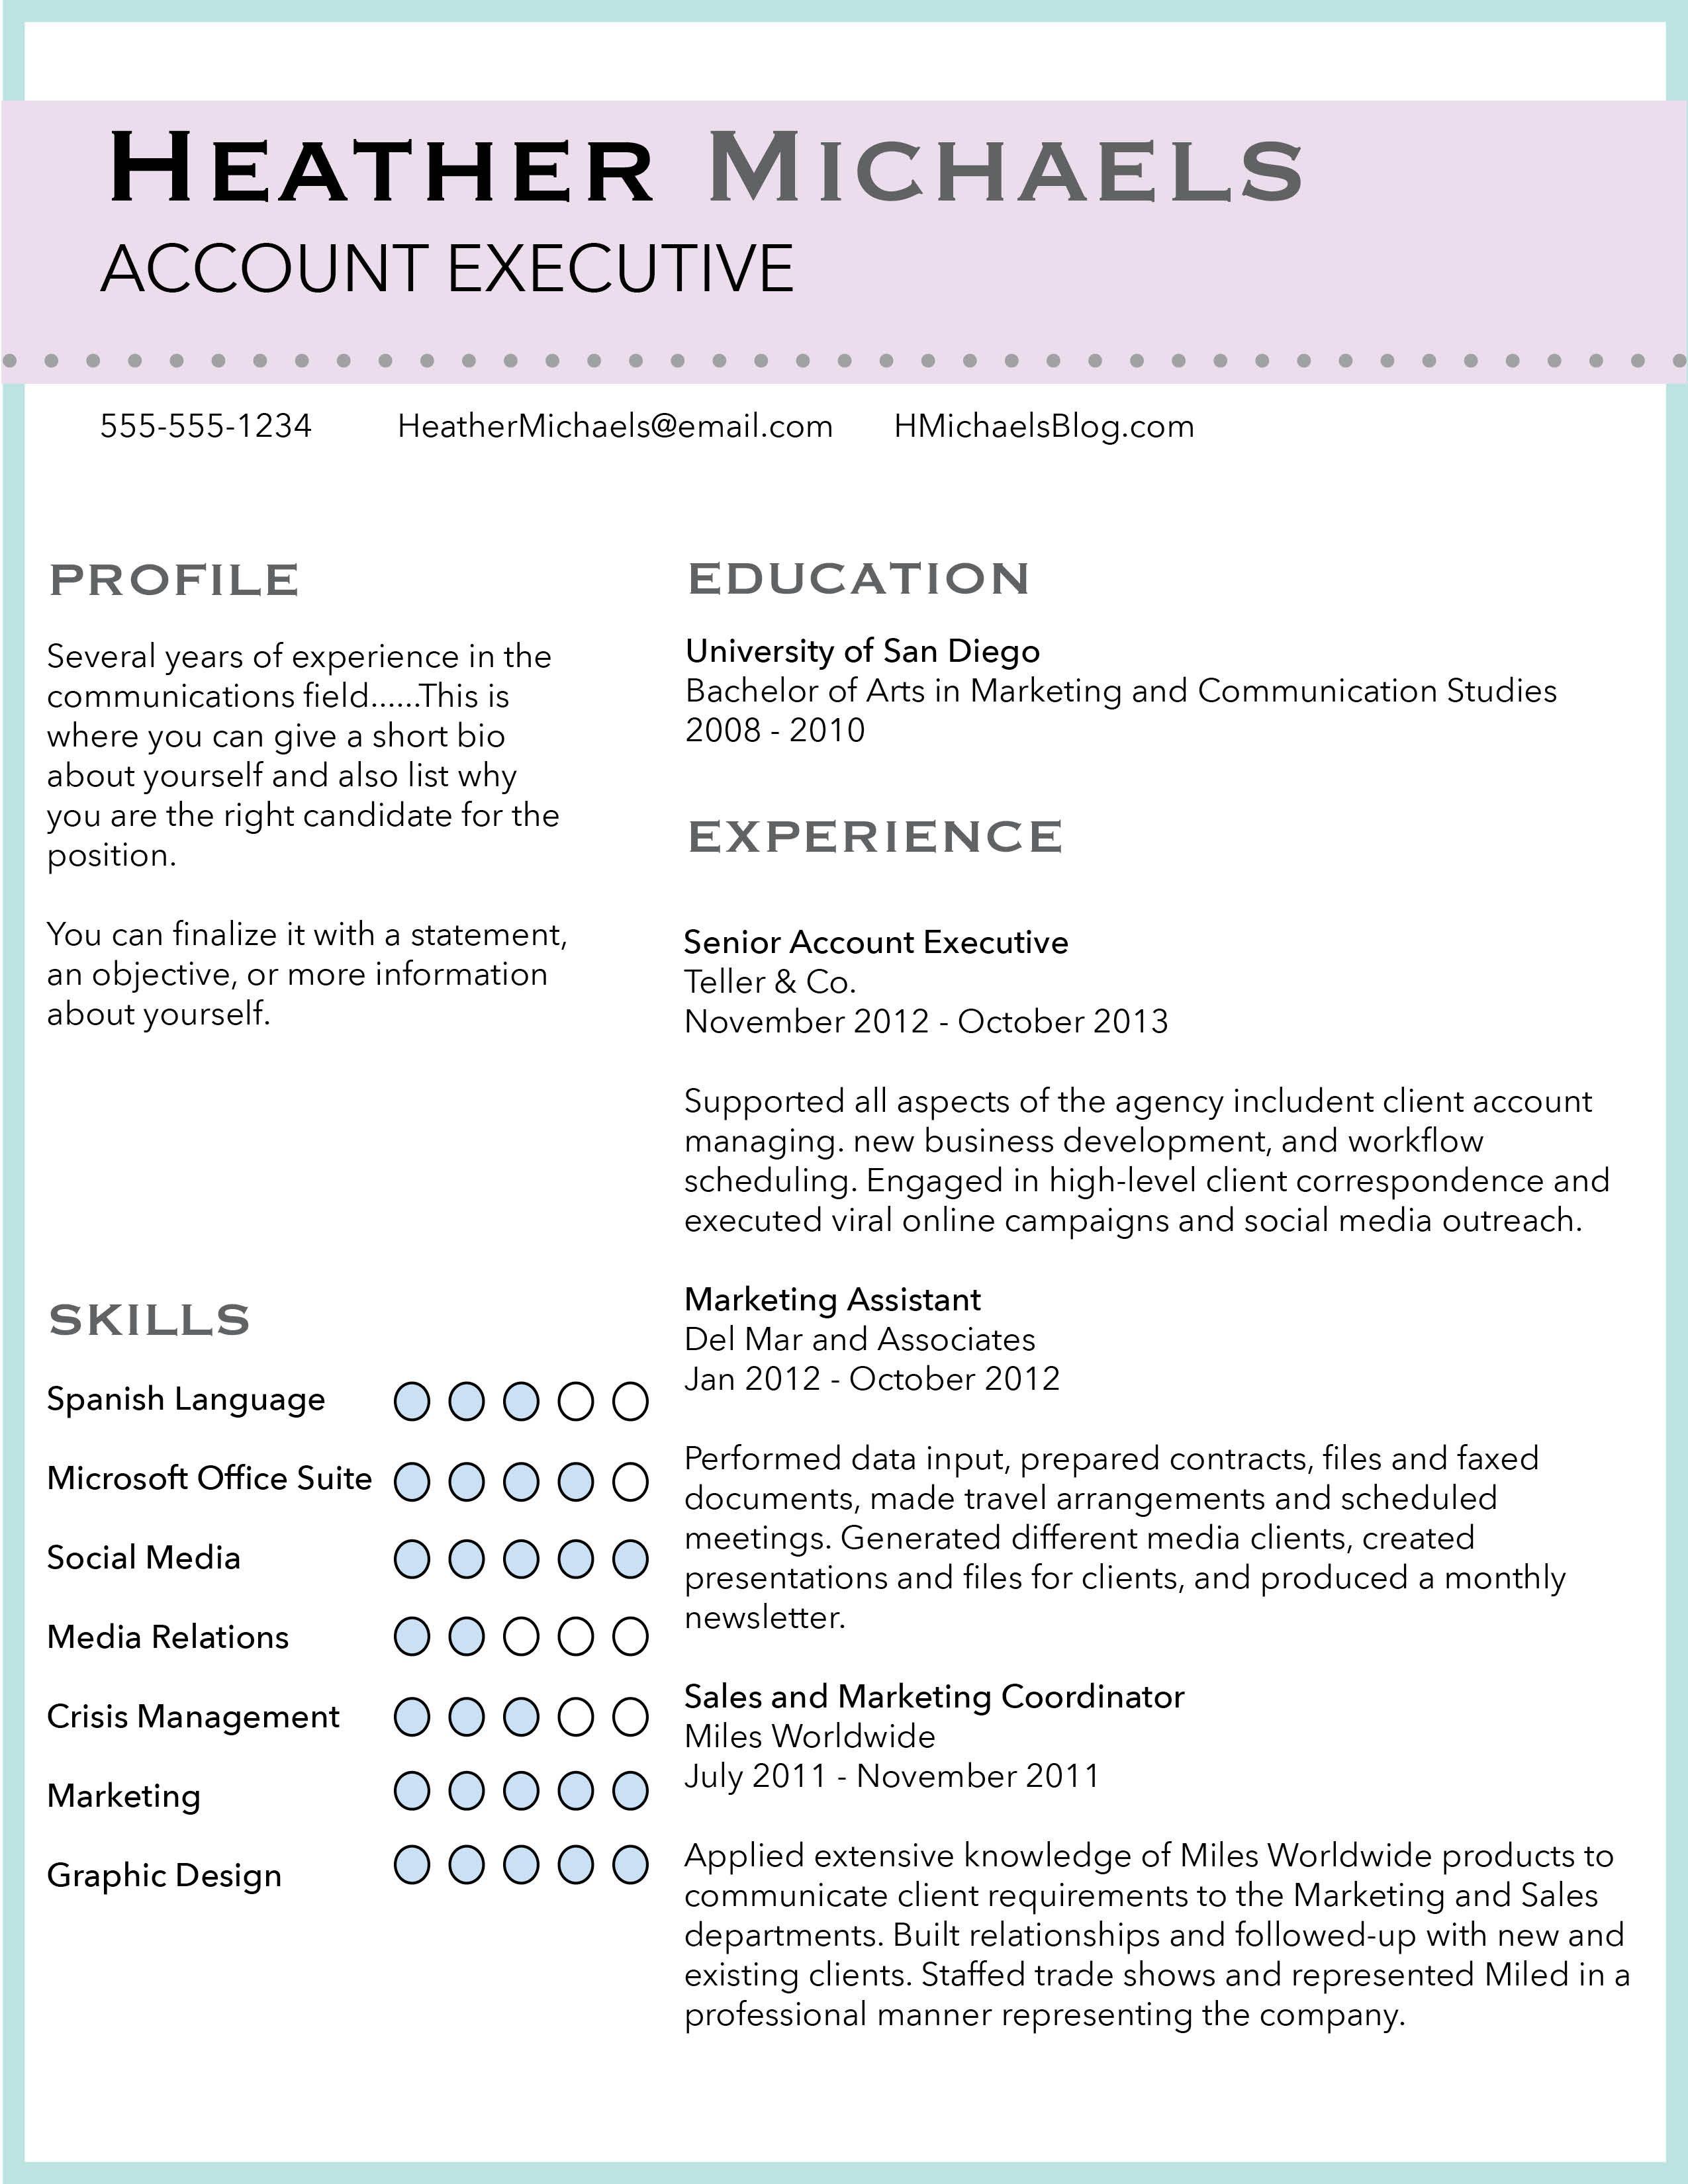 Resume Design Custom Resume Designs By Resumaker On Etsy Com Shop Resumaker Communication Studies Resume Resume Design